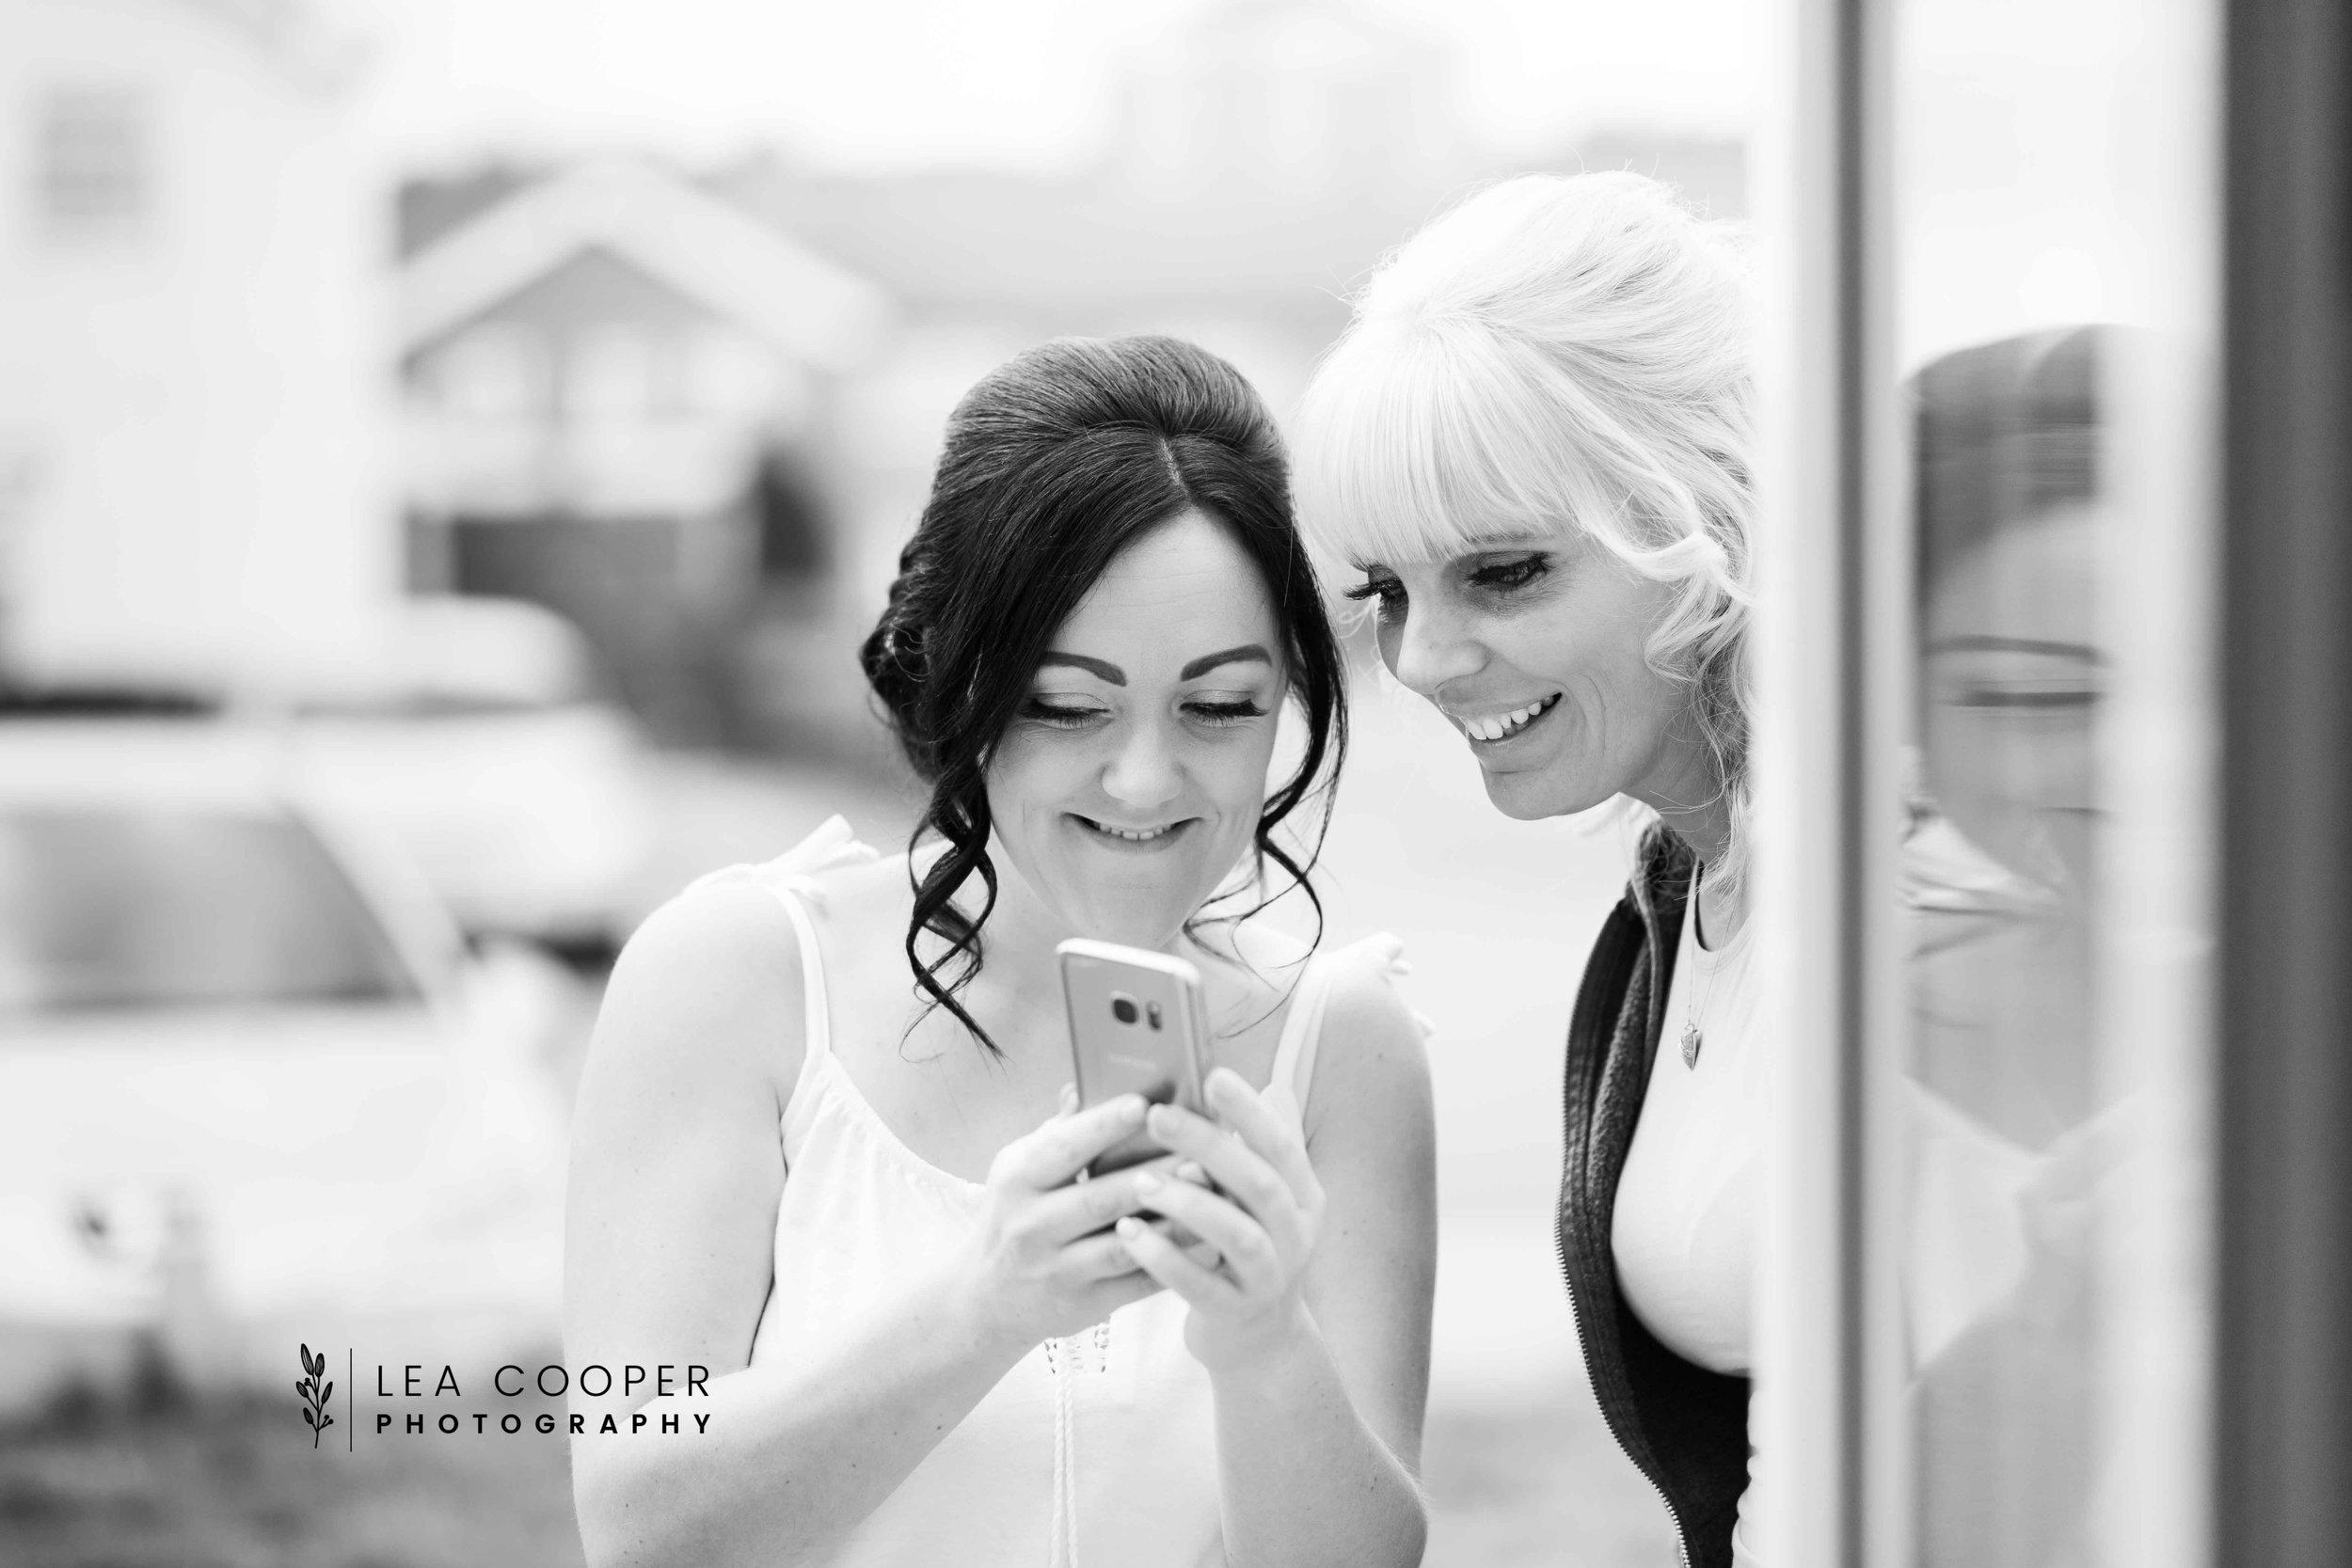 LEA-COOPER-PHOTOGRAPHY-WEDDING-PHOTOGRAPHER-WALSALL-FAIRLAWNS-HOTEL-AND-SPA-ALDRIDGE-WOLVERHAMPTON-UK-WEDDING-PHOTOS-WILLENHALL-16.jpg